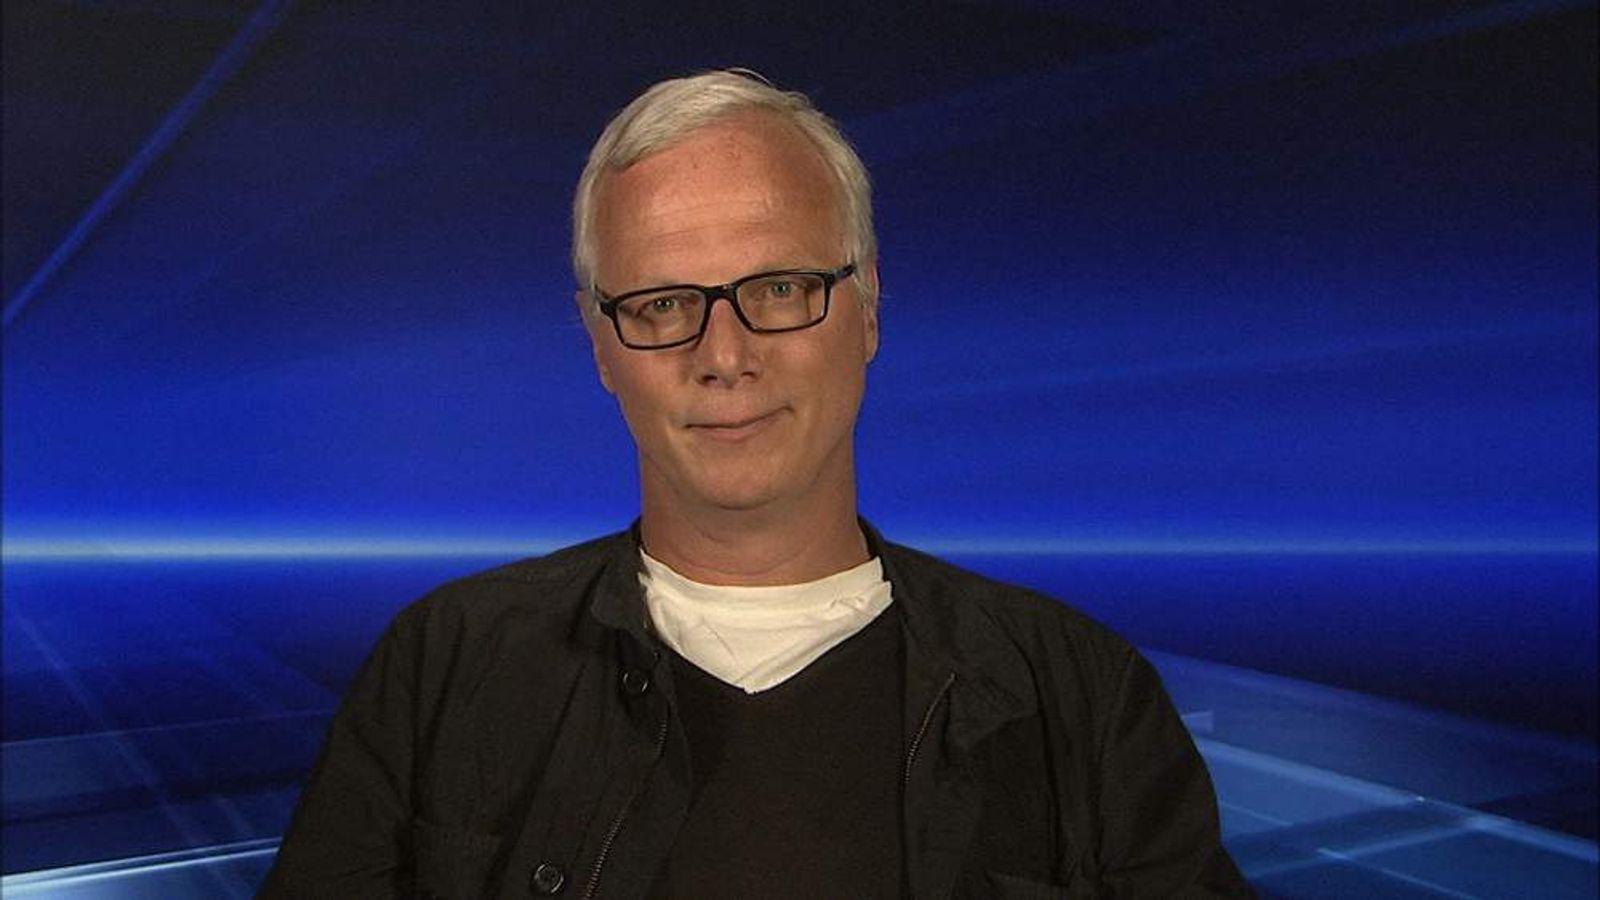 Documentary-maker Sean Langan spent 4 months as a Taliban prisoner